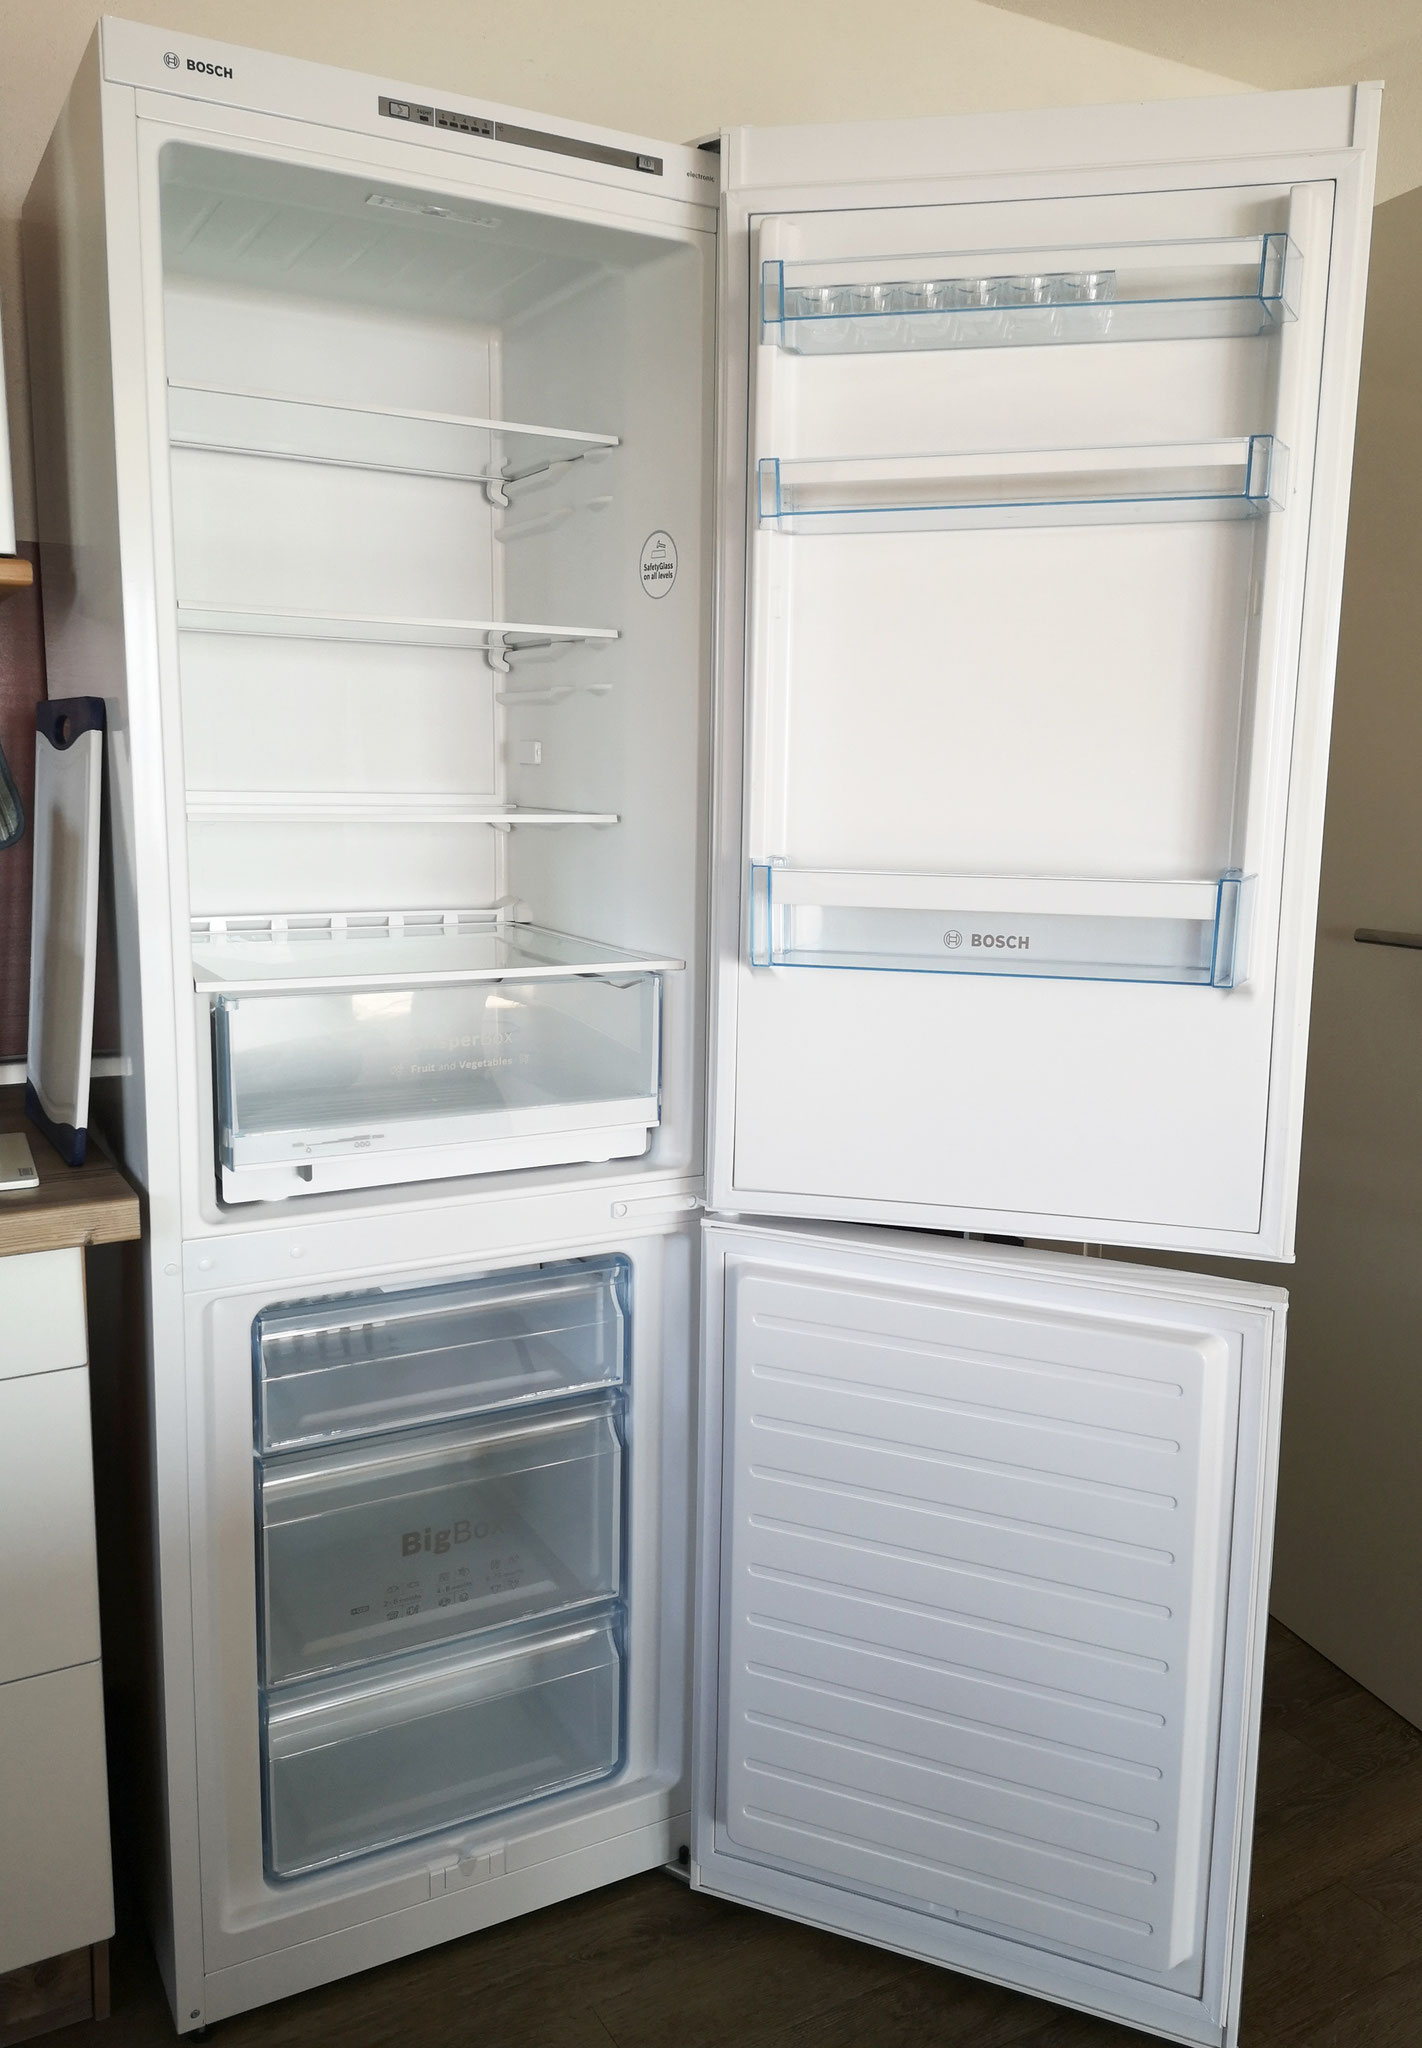 große Kühl-/Gefrierkombination